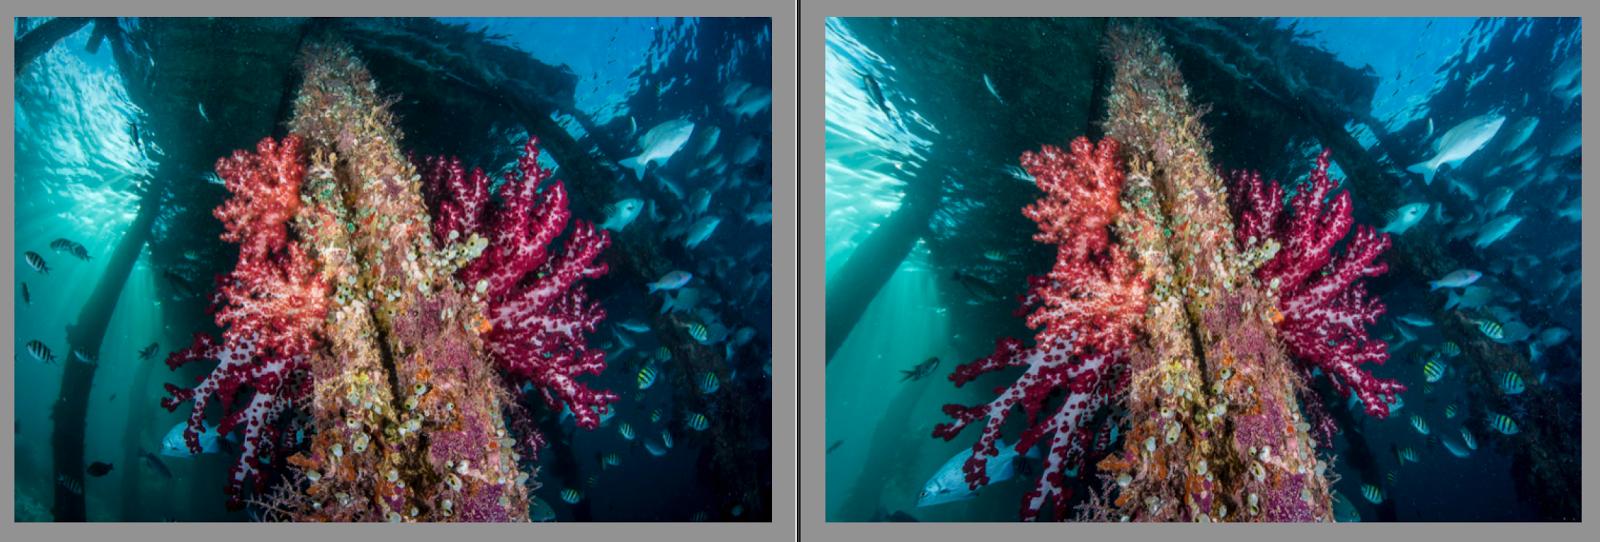 Correcting Lens Distortion in Underwater Photos